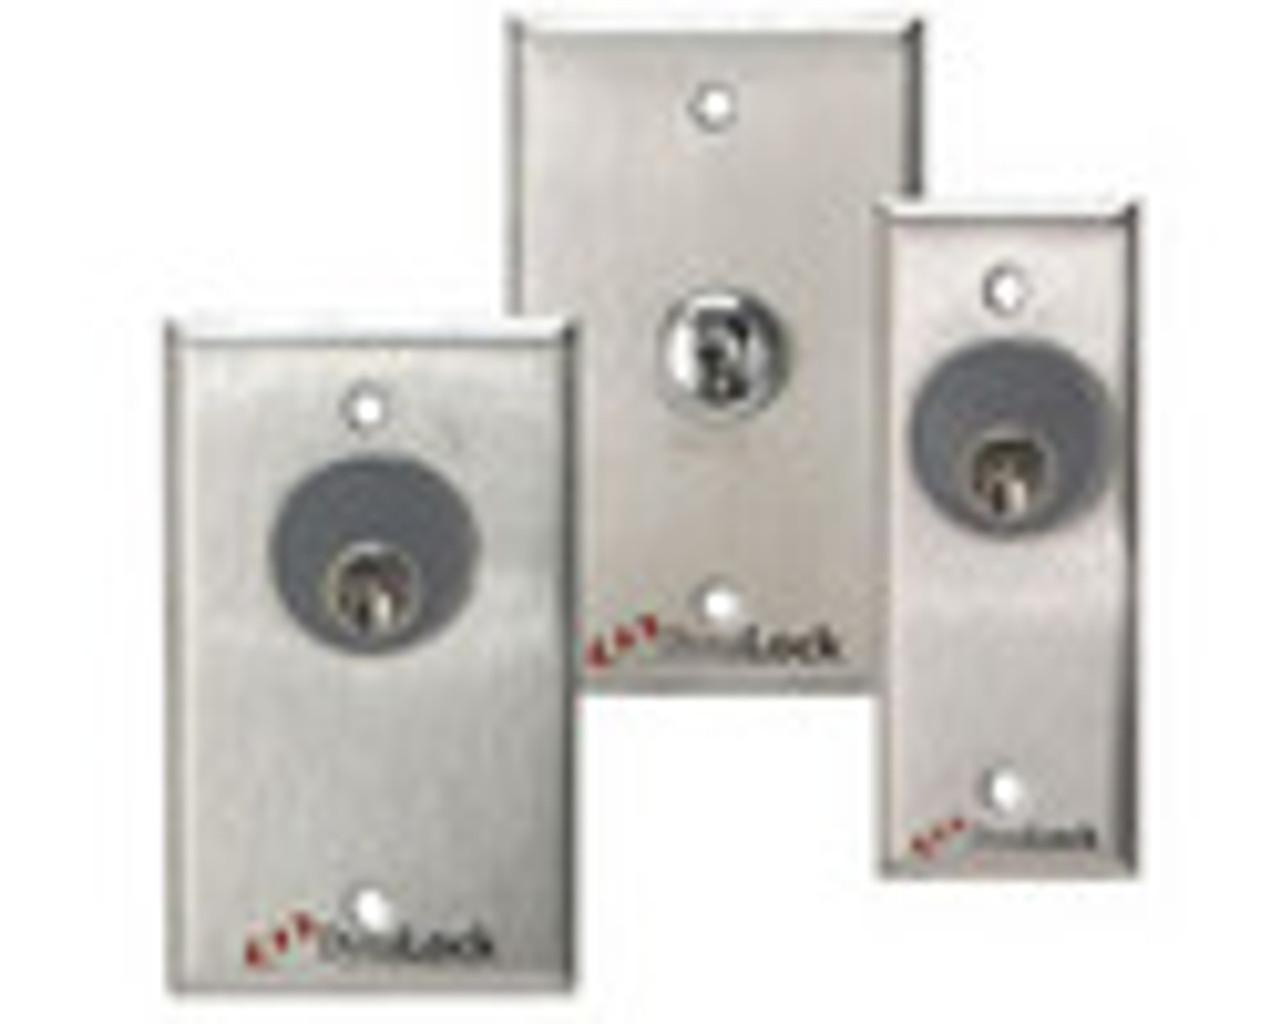 3002TJ32-US10B-DSM2 DynaLock 3000 Series 1500 LBs Double Electromagnetic Lock for Inswing Door with DSM in Oil Rubbed Bronze